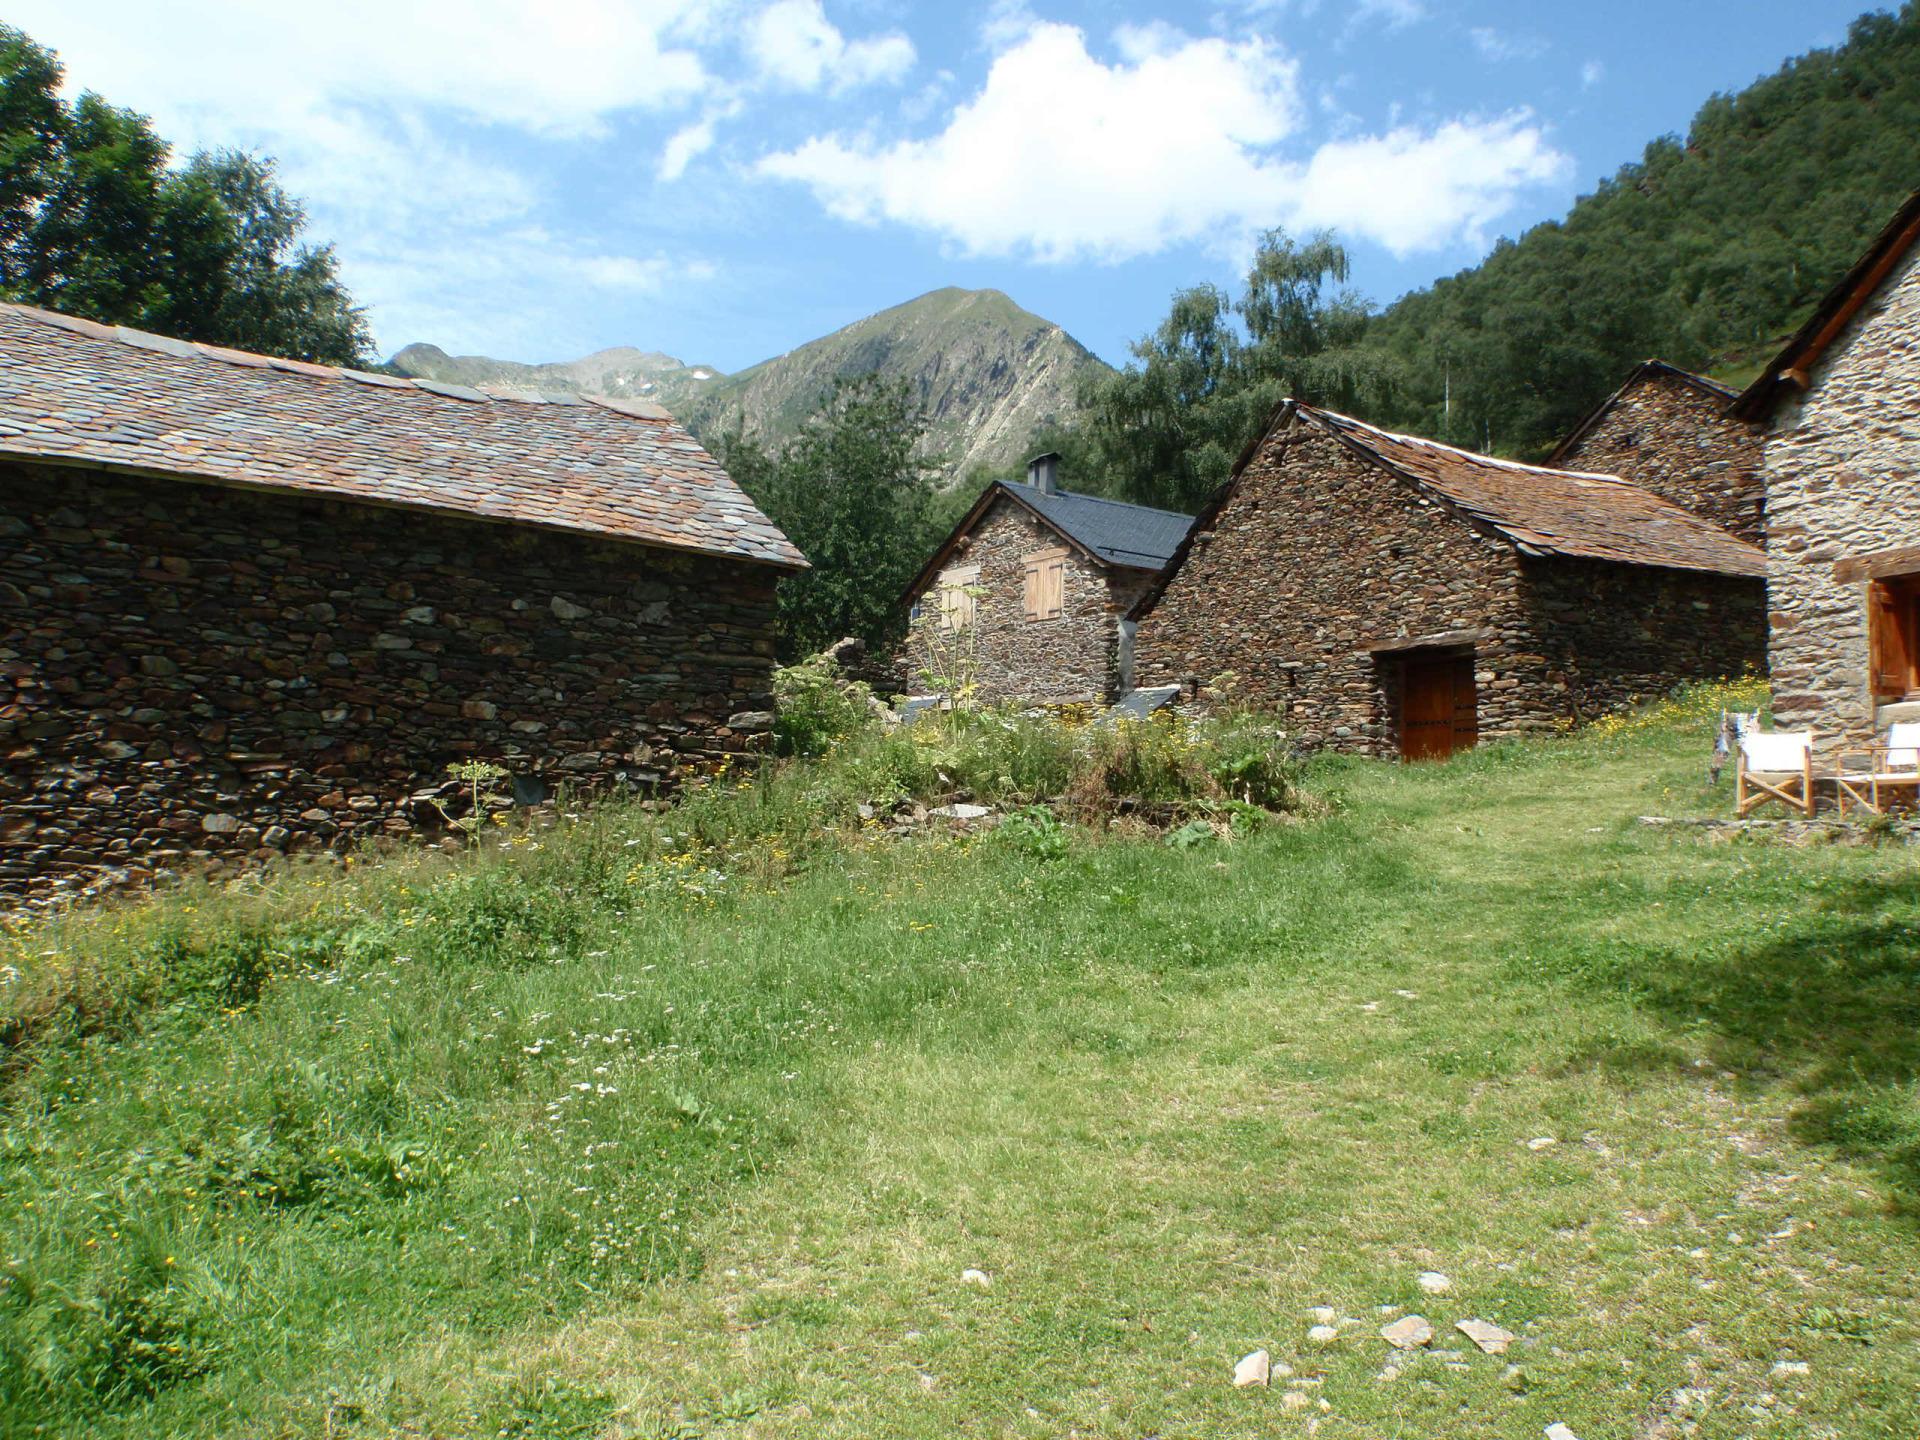 Pyrenees 2016 and celebrating birthday